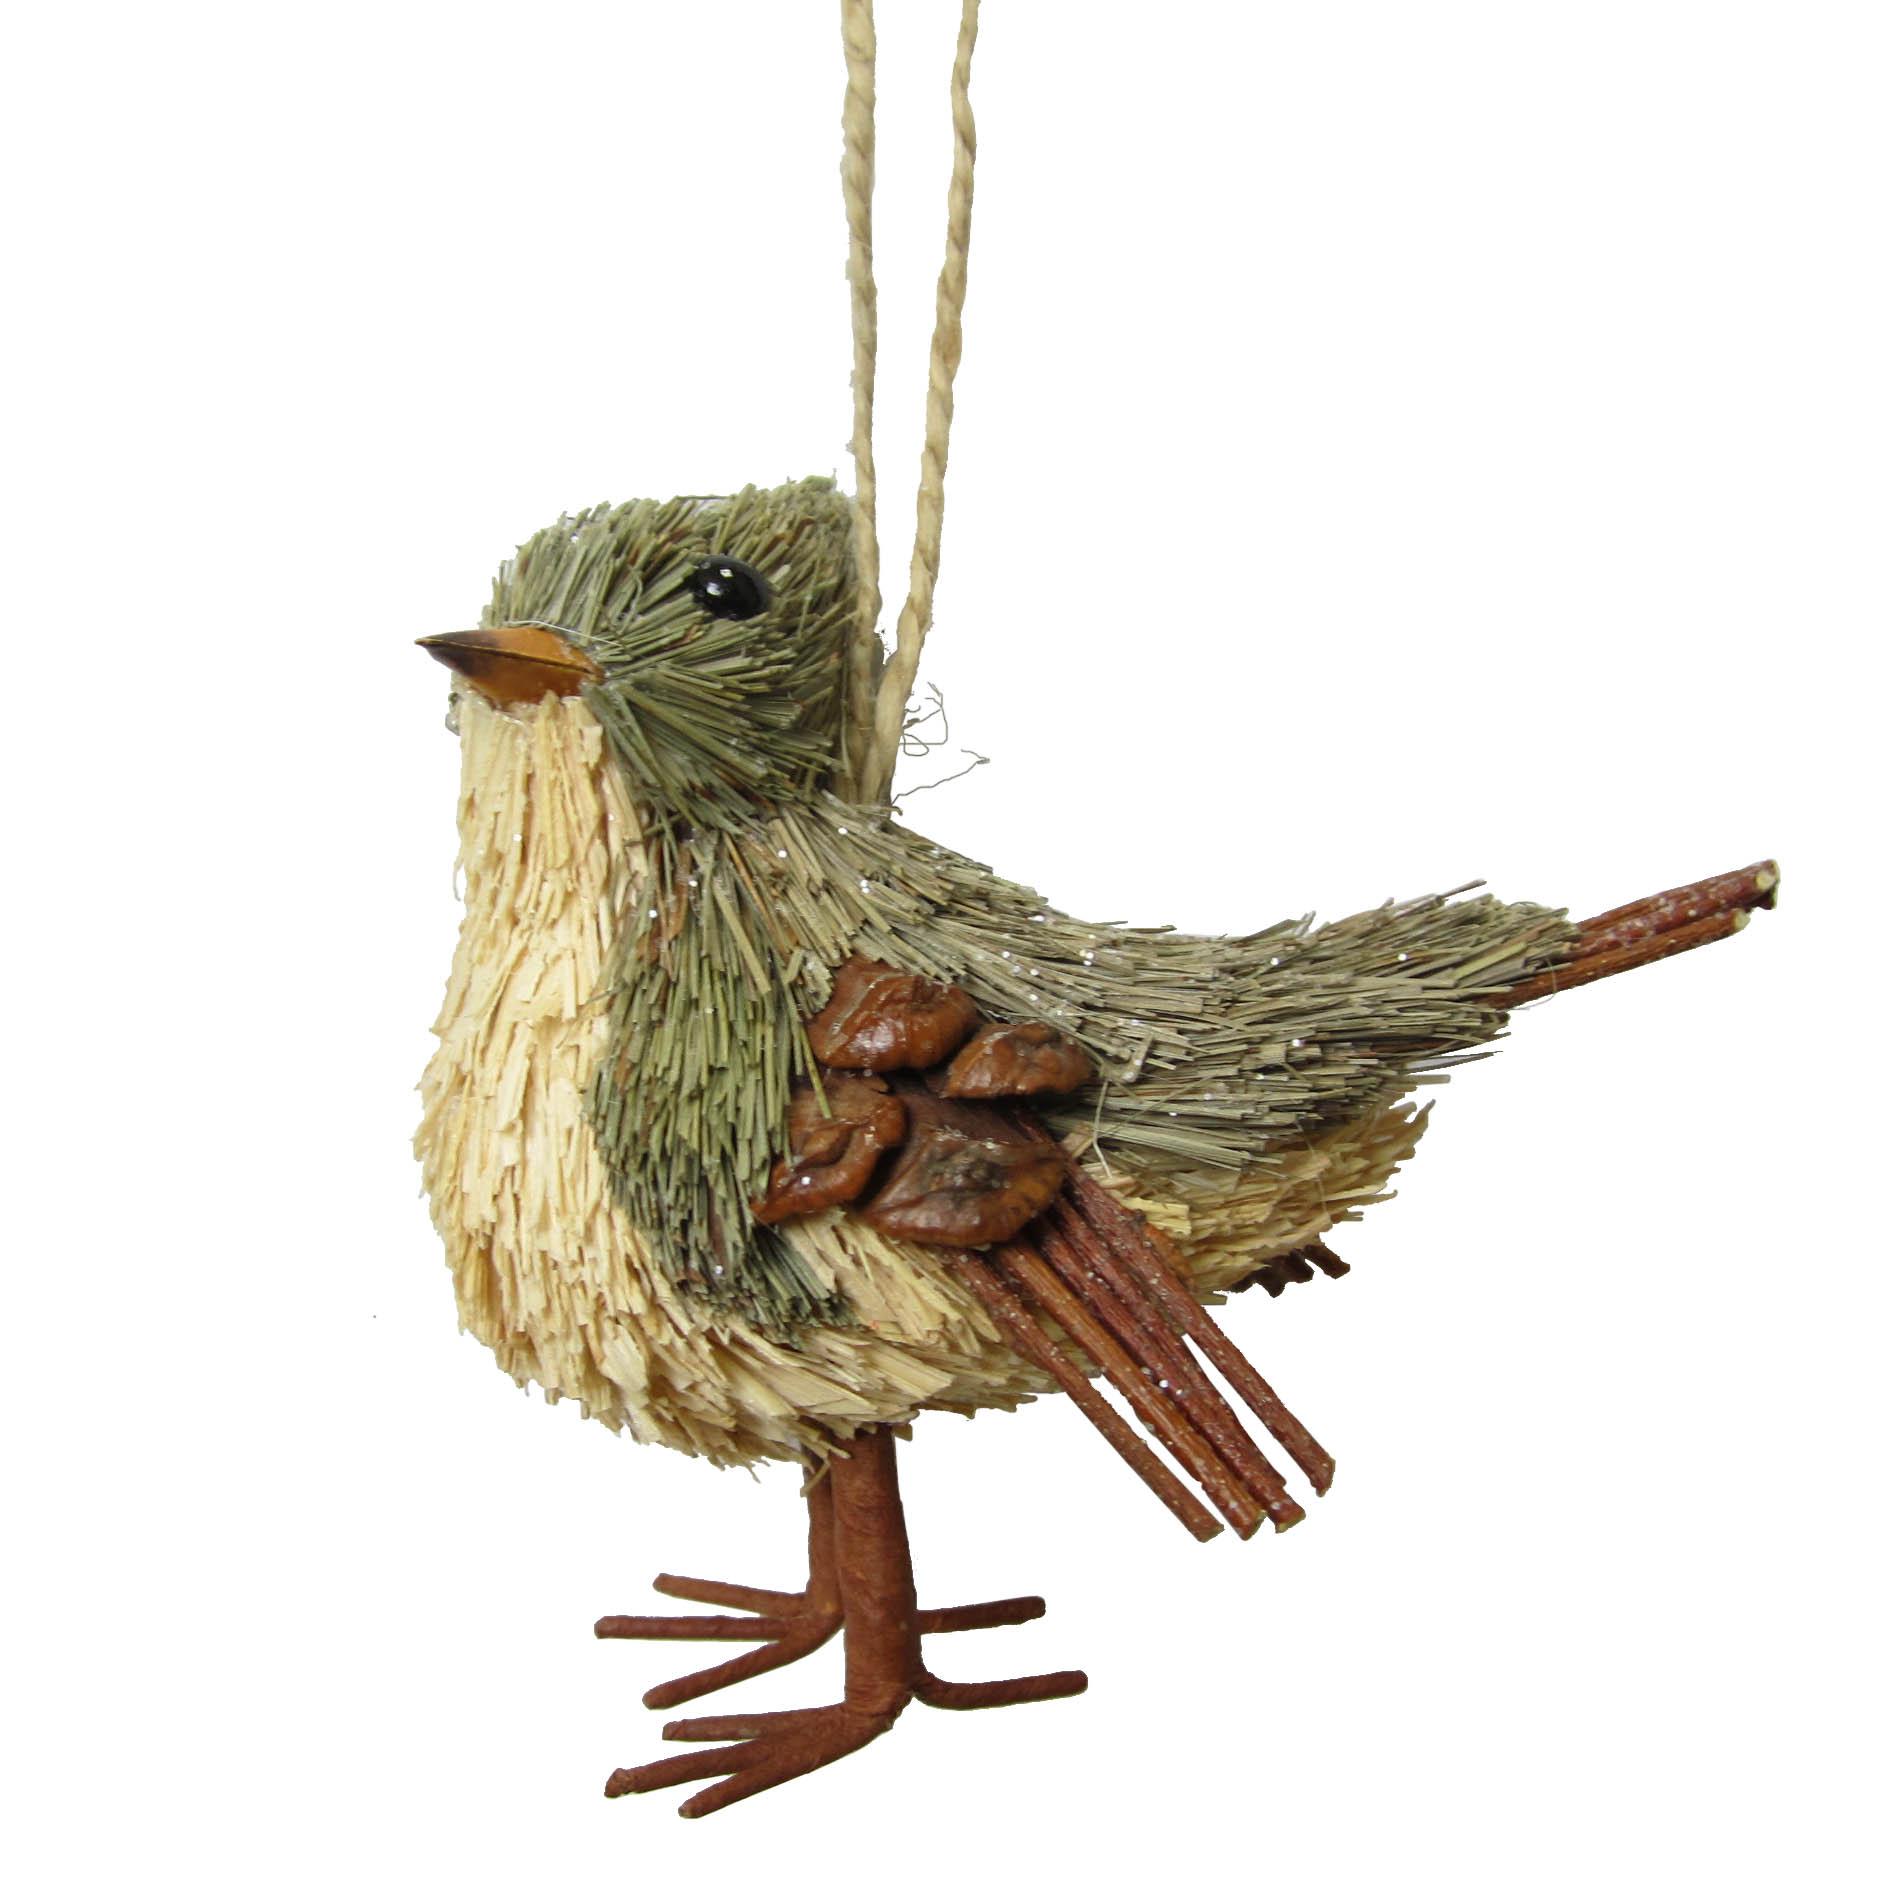 "Jaclyn Smith 3"" Sisal Bird Christmas Ornament PartNumber: 009W007688464002P KsnValue: 7688464 MfgPartNumber: S09150-KRE"